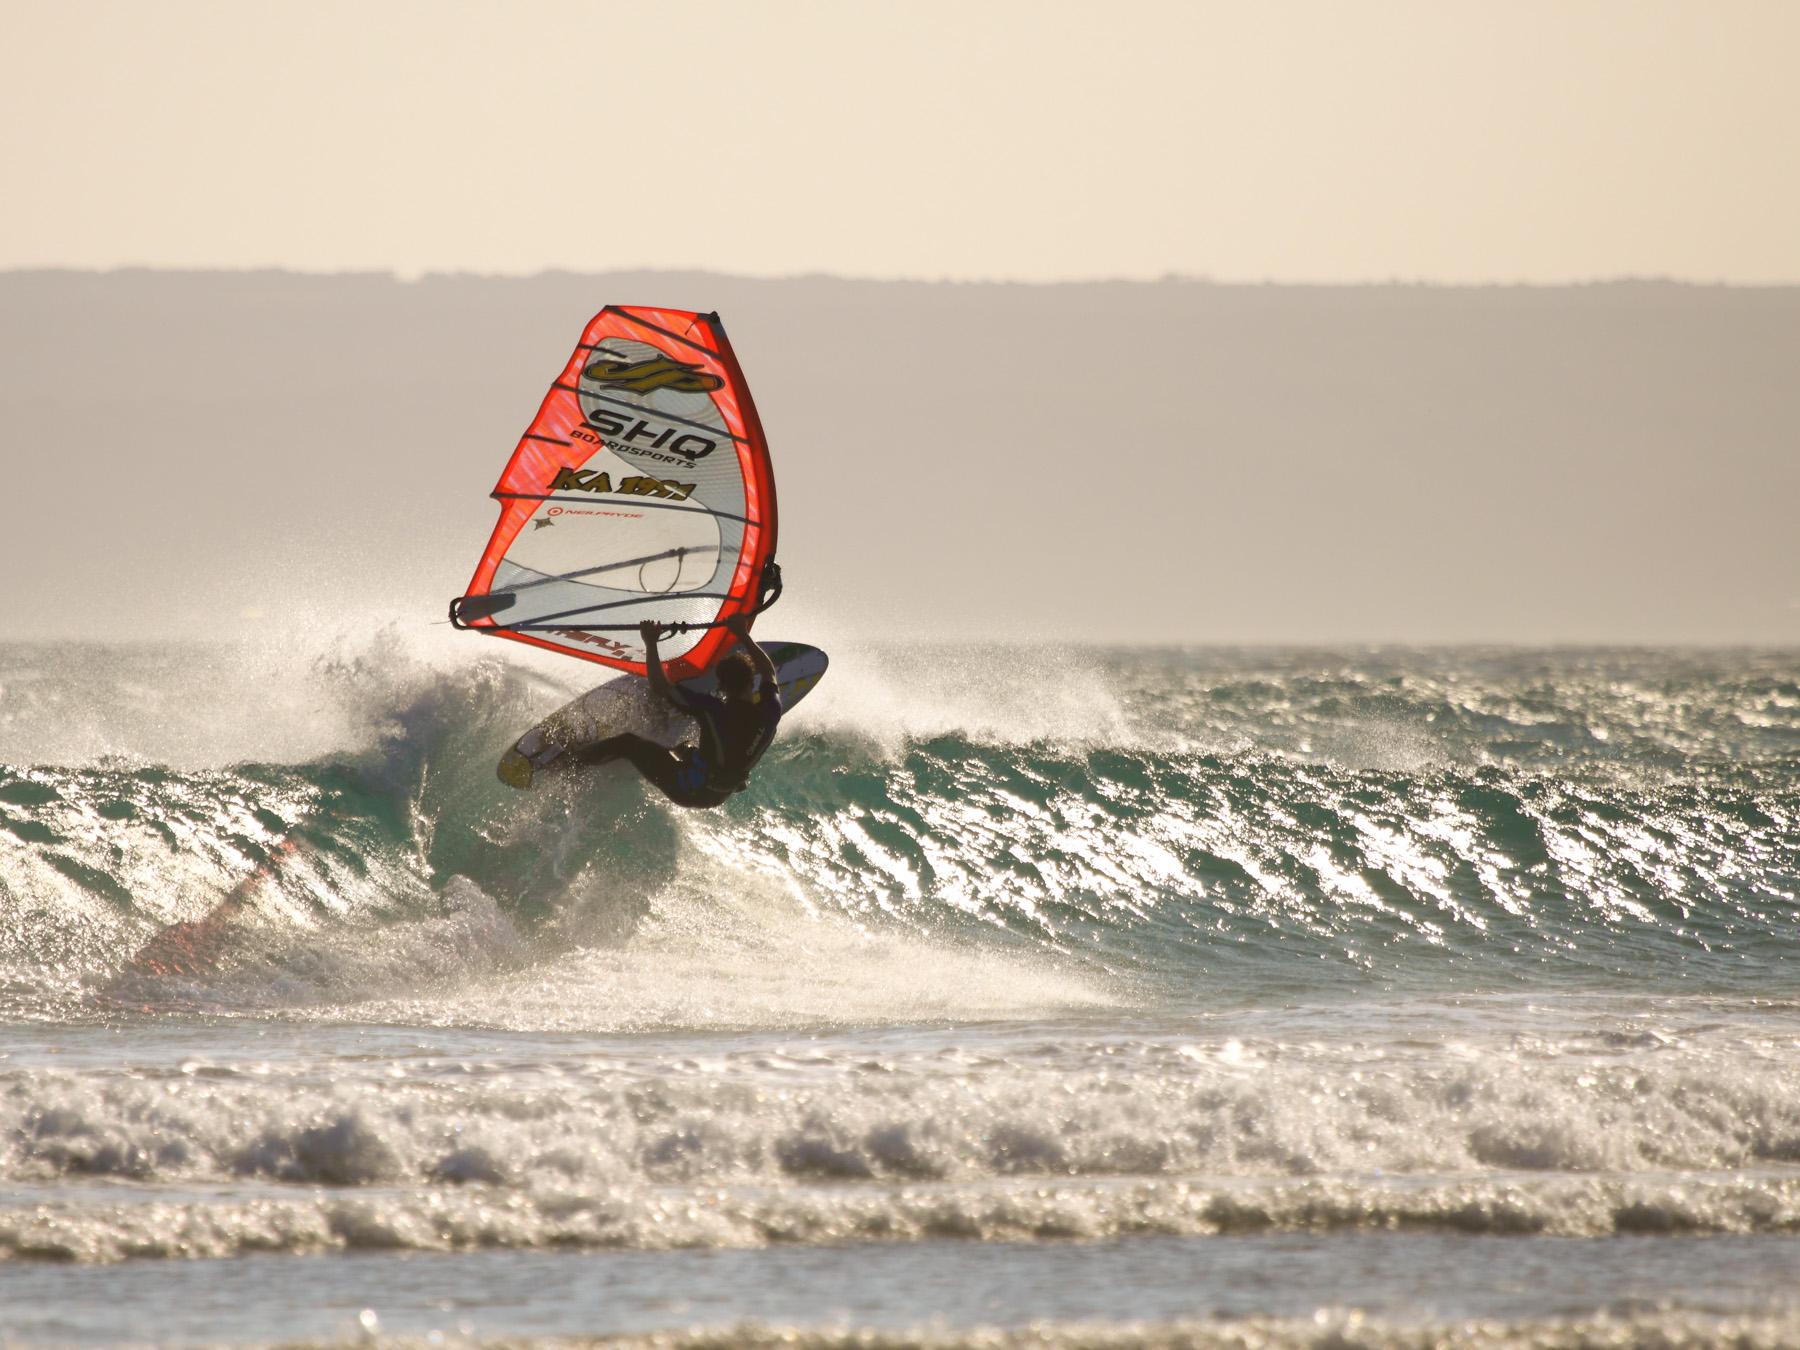 alastair mcleod windsurfing long arms at sandy point